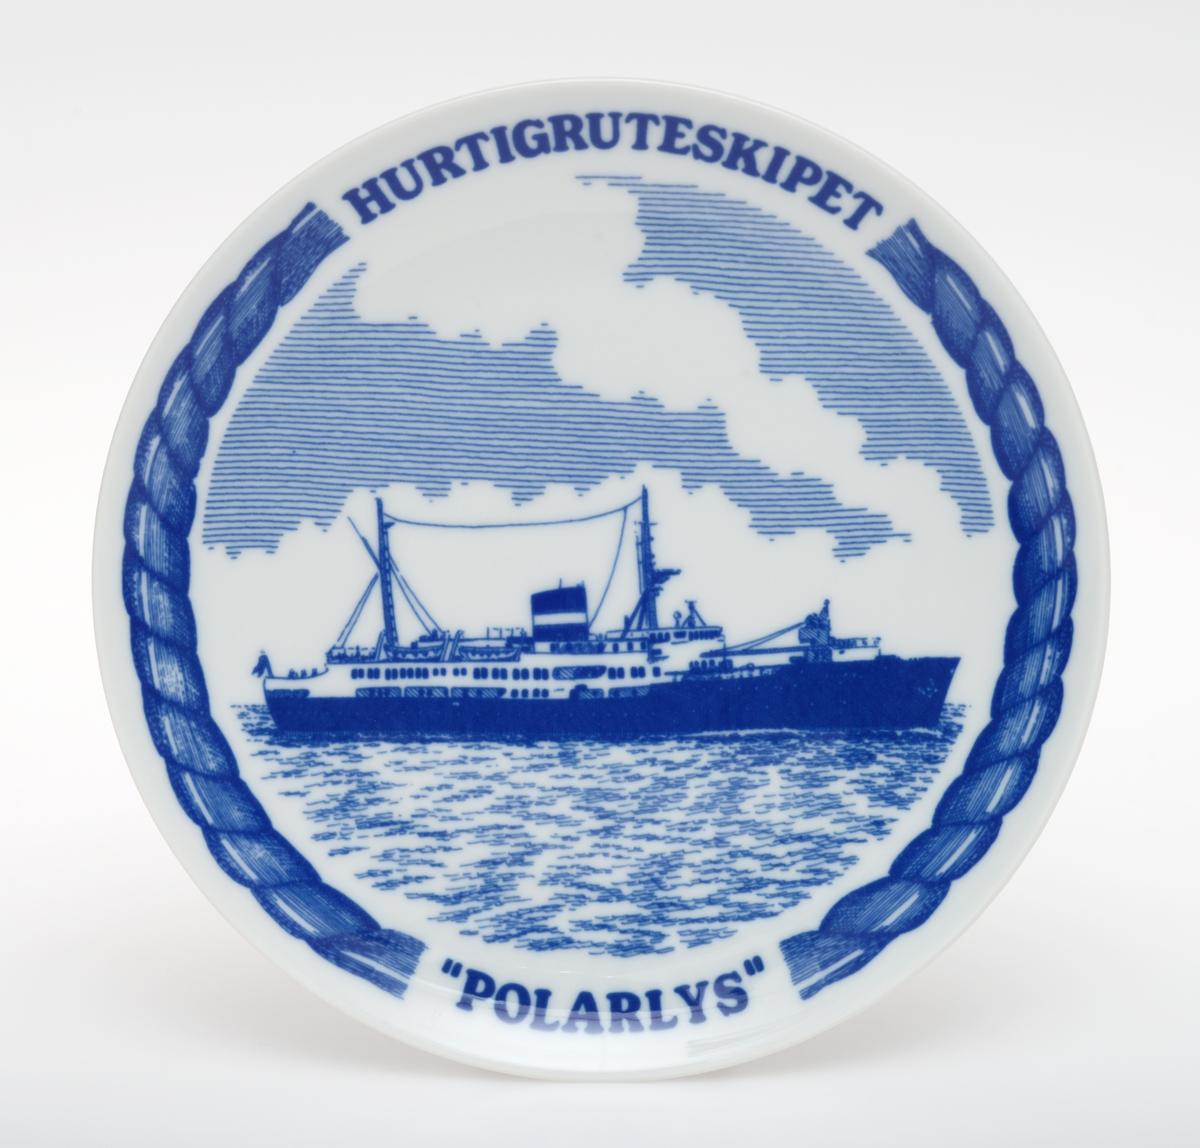 Motiv av Hurtigruten M/S Polarlys.